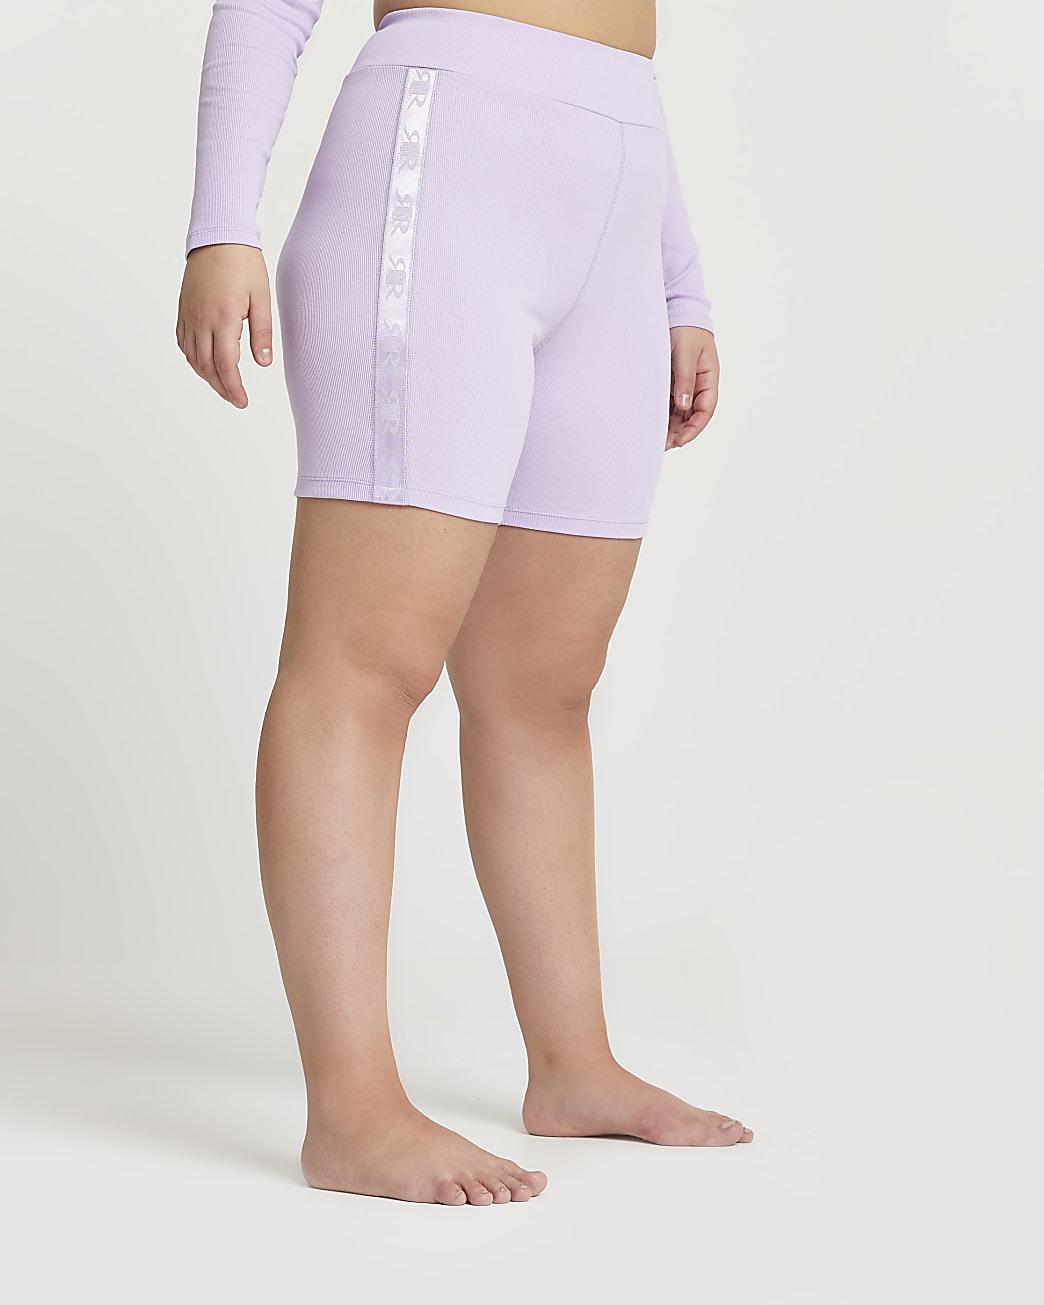 Plus Intimates purple ribbed cycling shorts